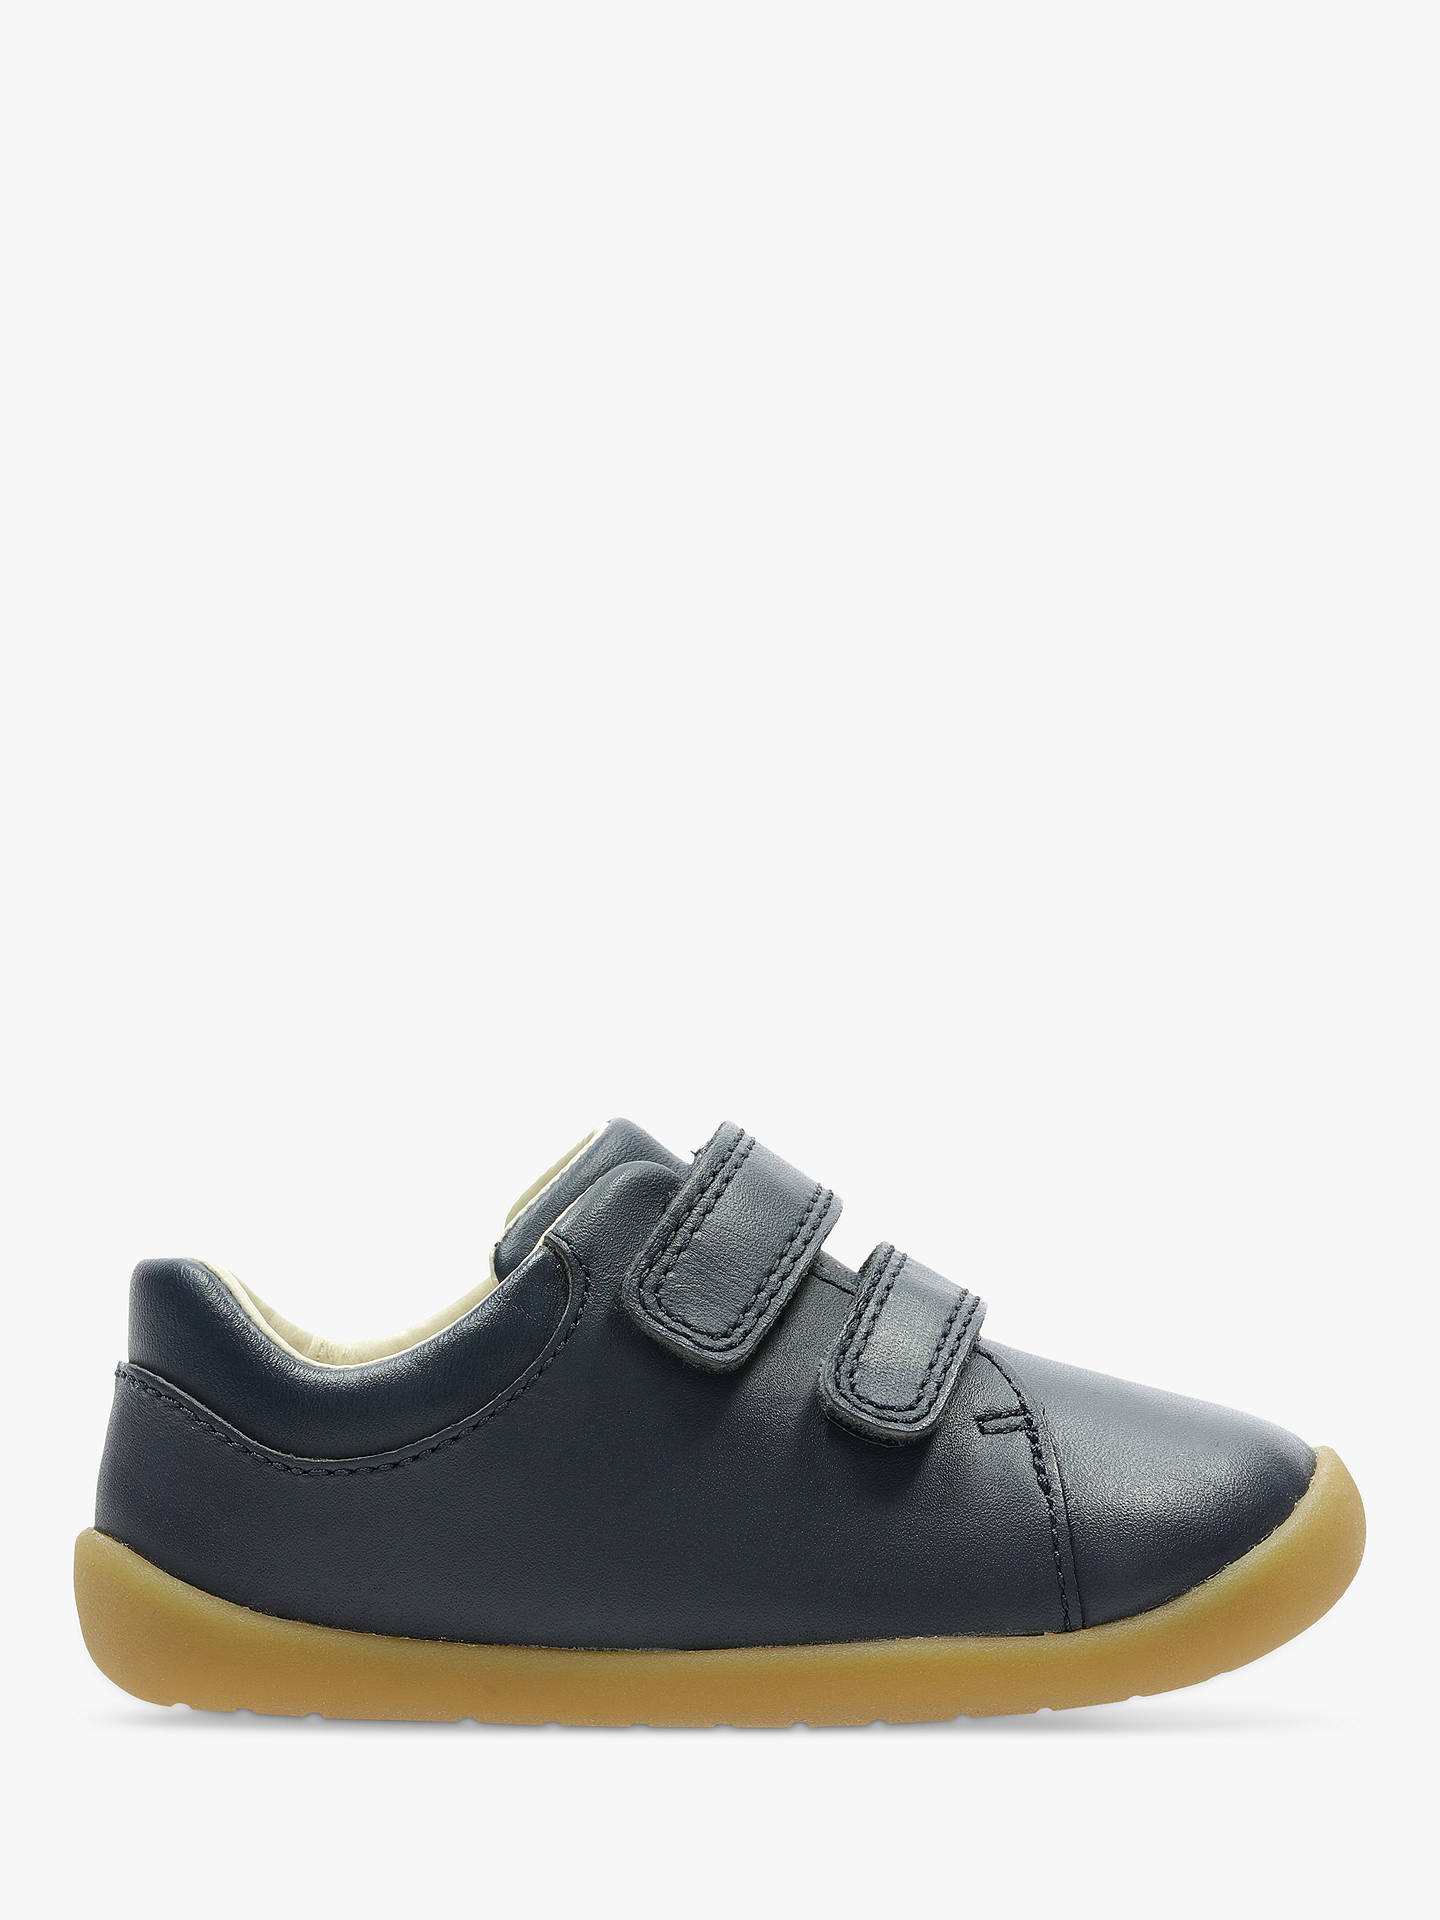 1cf437b26b66 Buy Clarks Children s Roamer Craft Pre-Walker Shoes